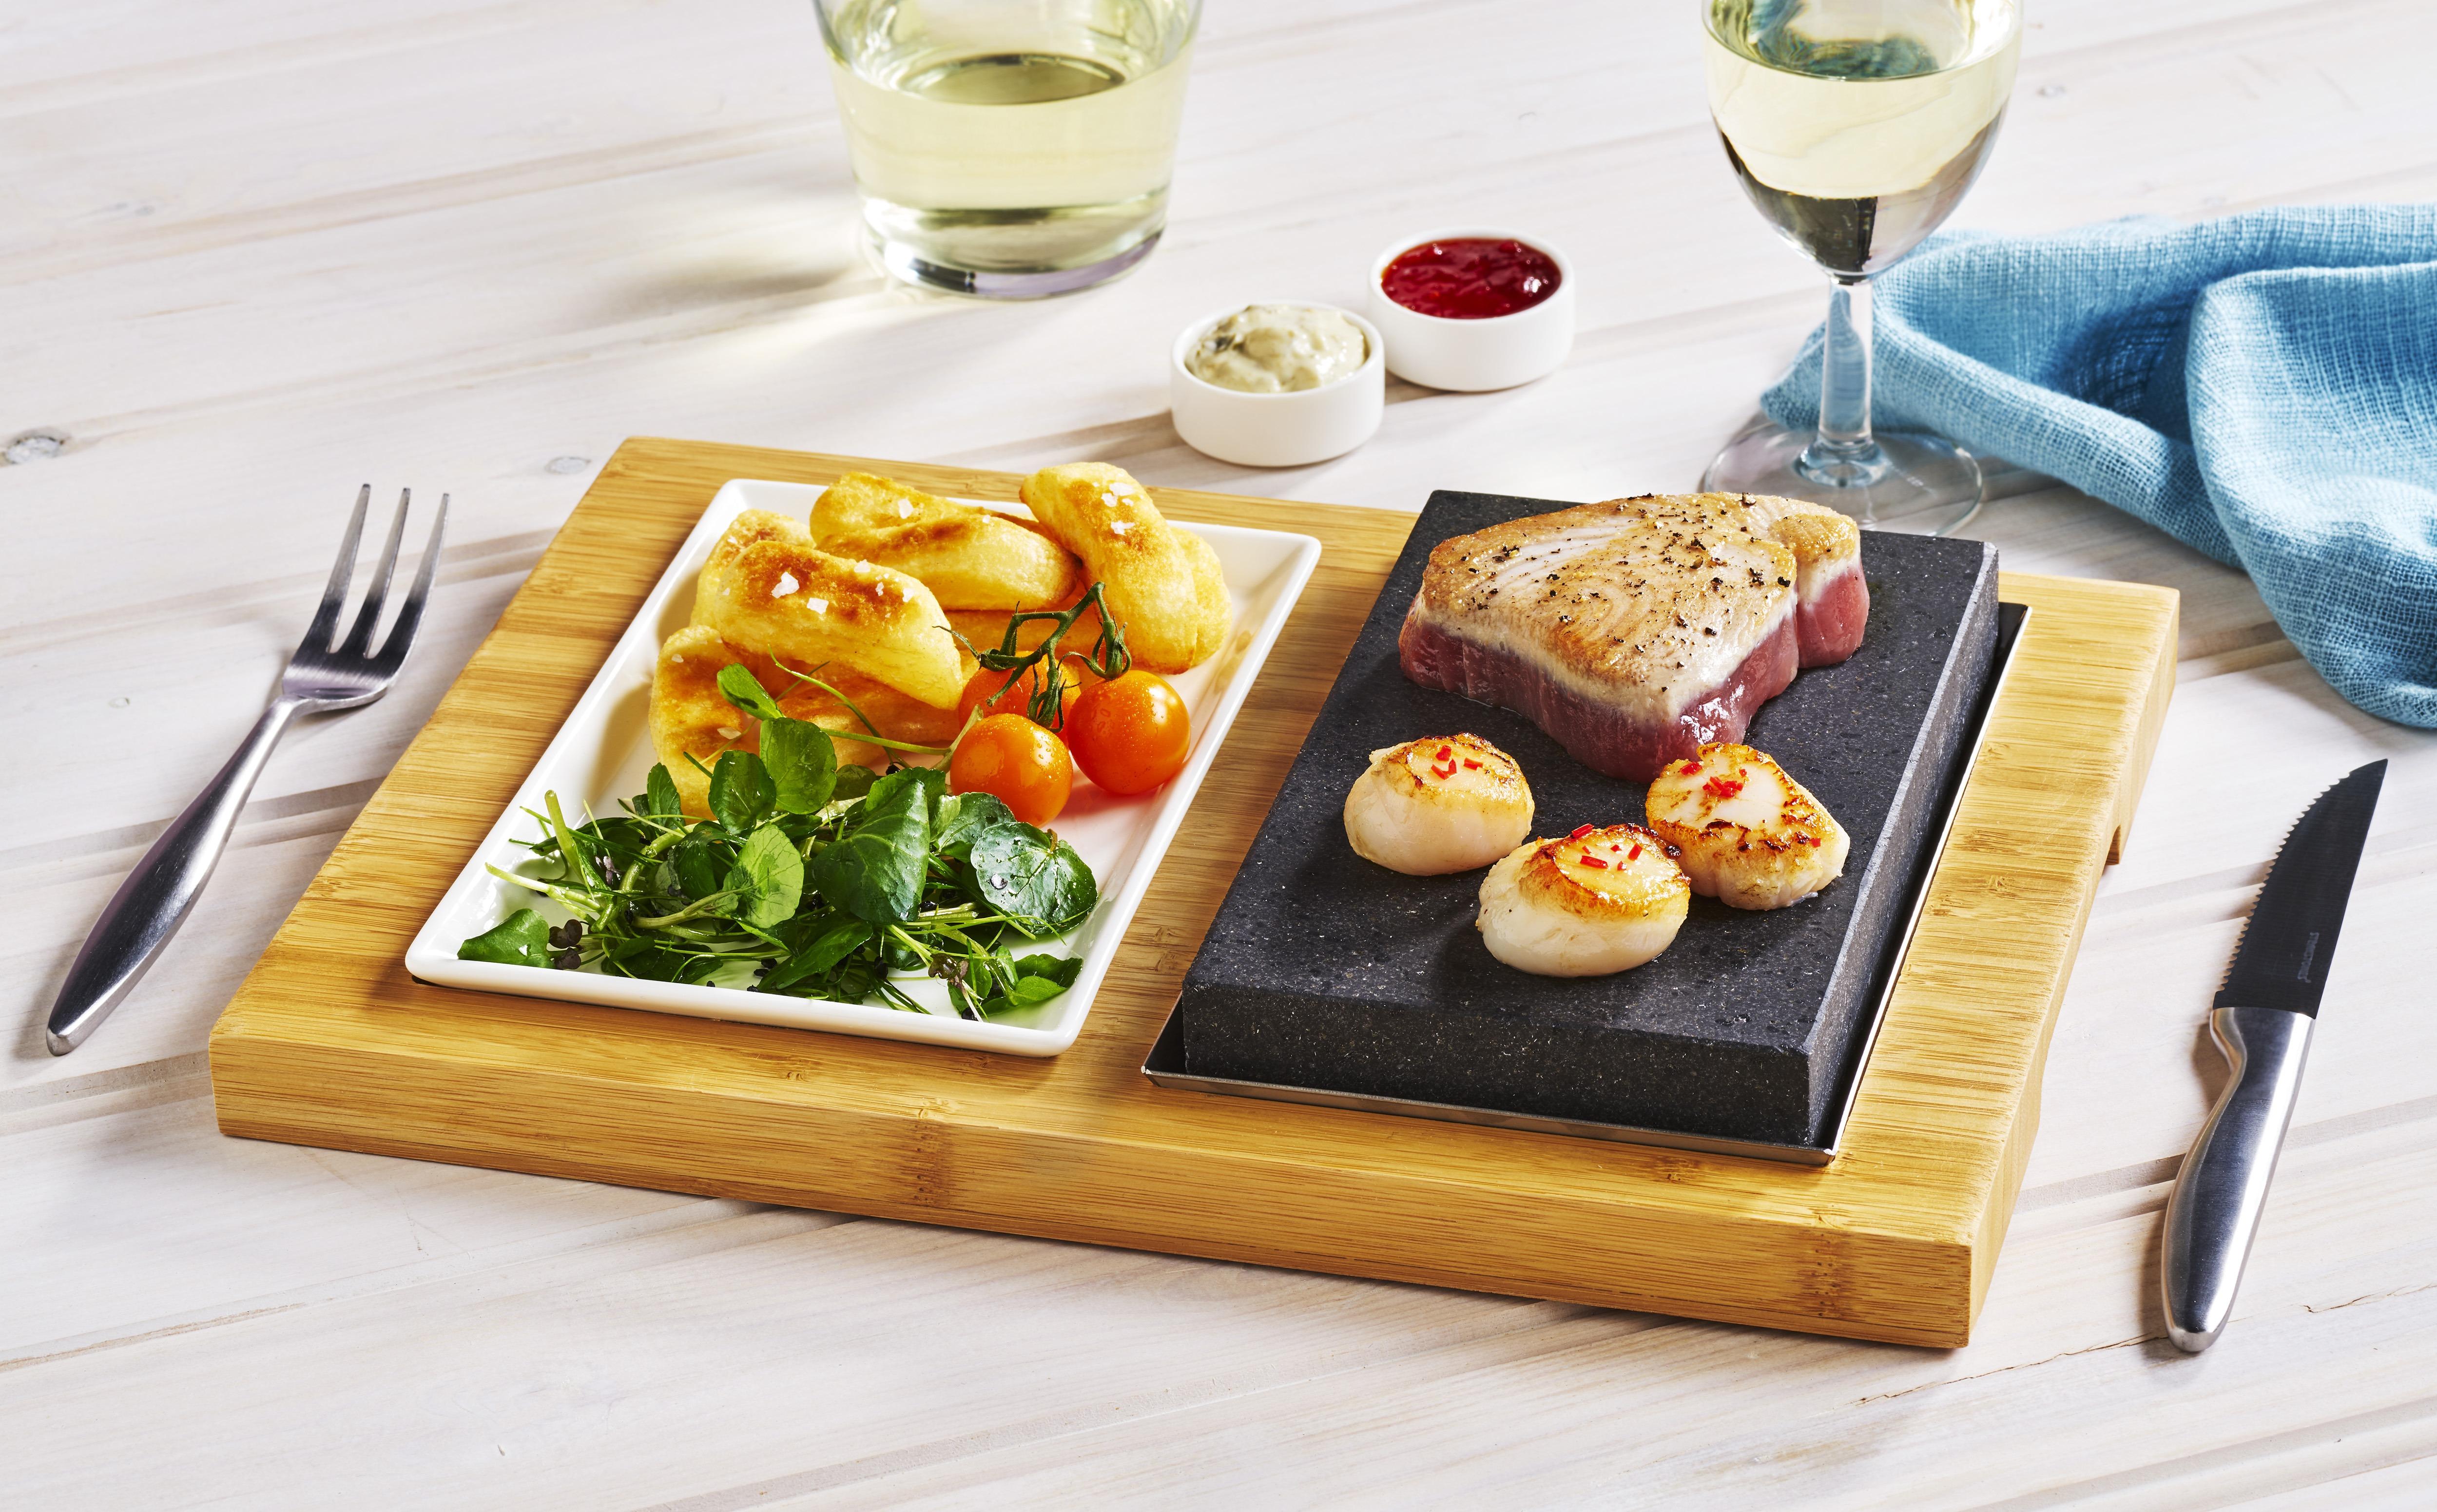 Tuna & Scallops on the Steak & Sides Set